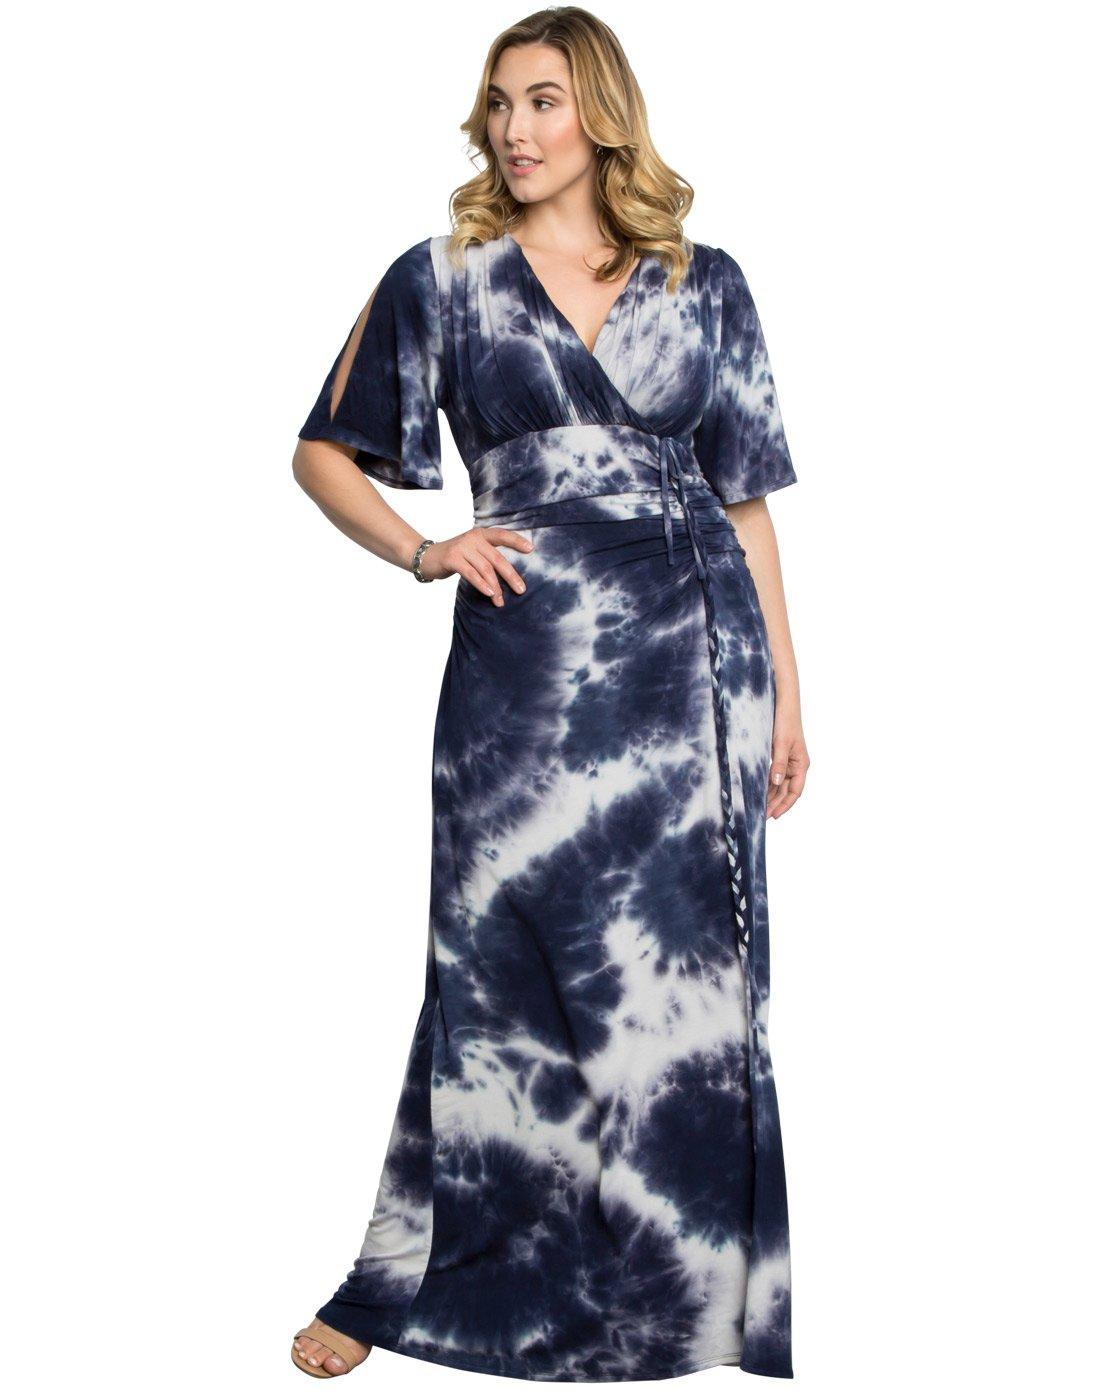 Kiyonna Women's Plus Size Bella Braided Maxi Dress 3X Moonlight Sea